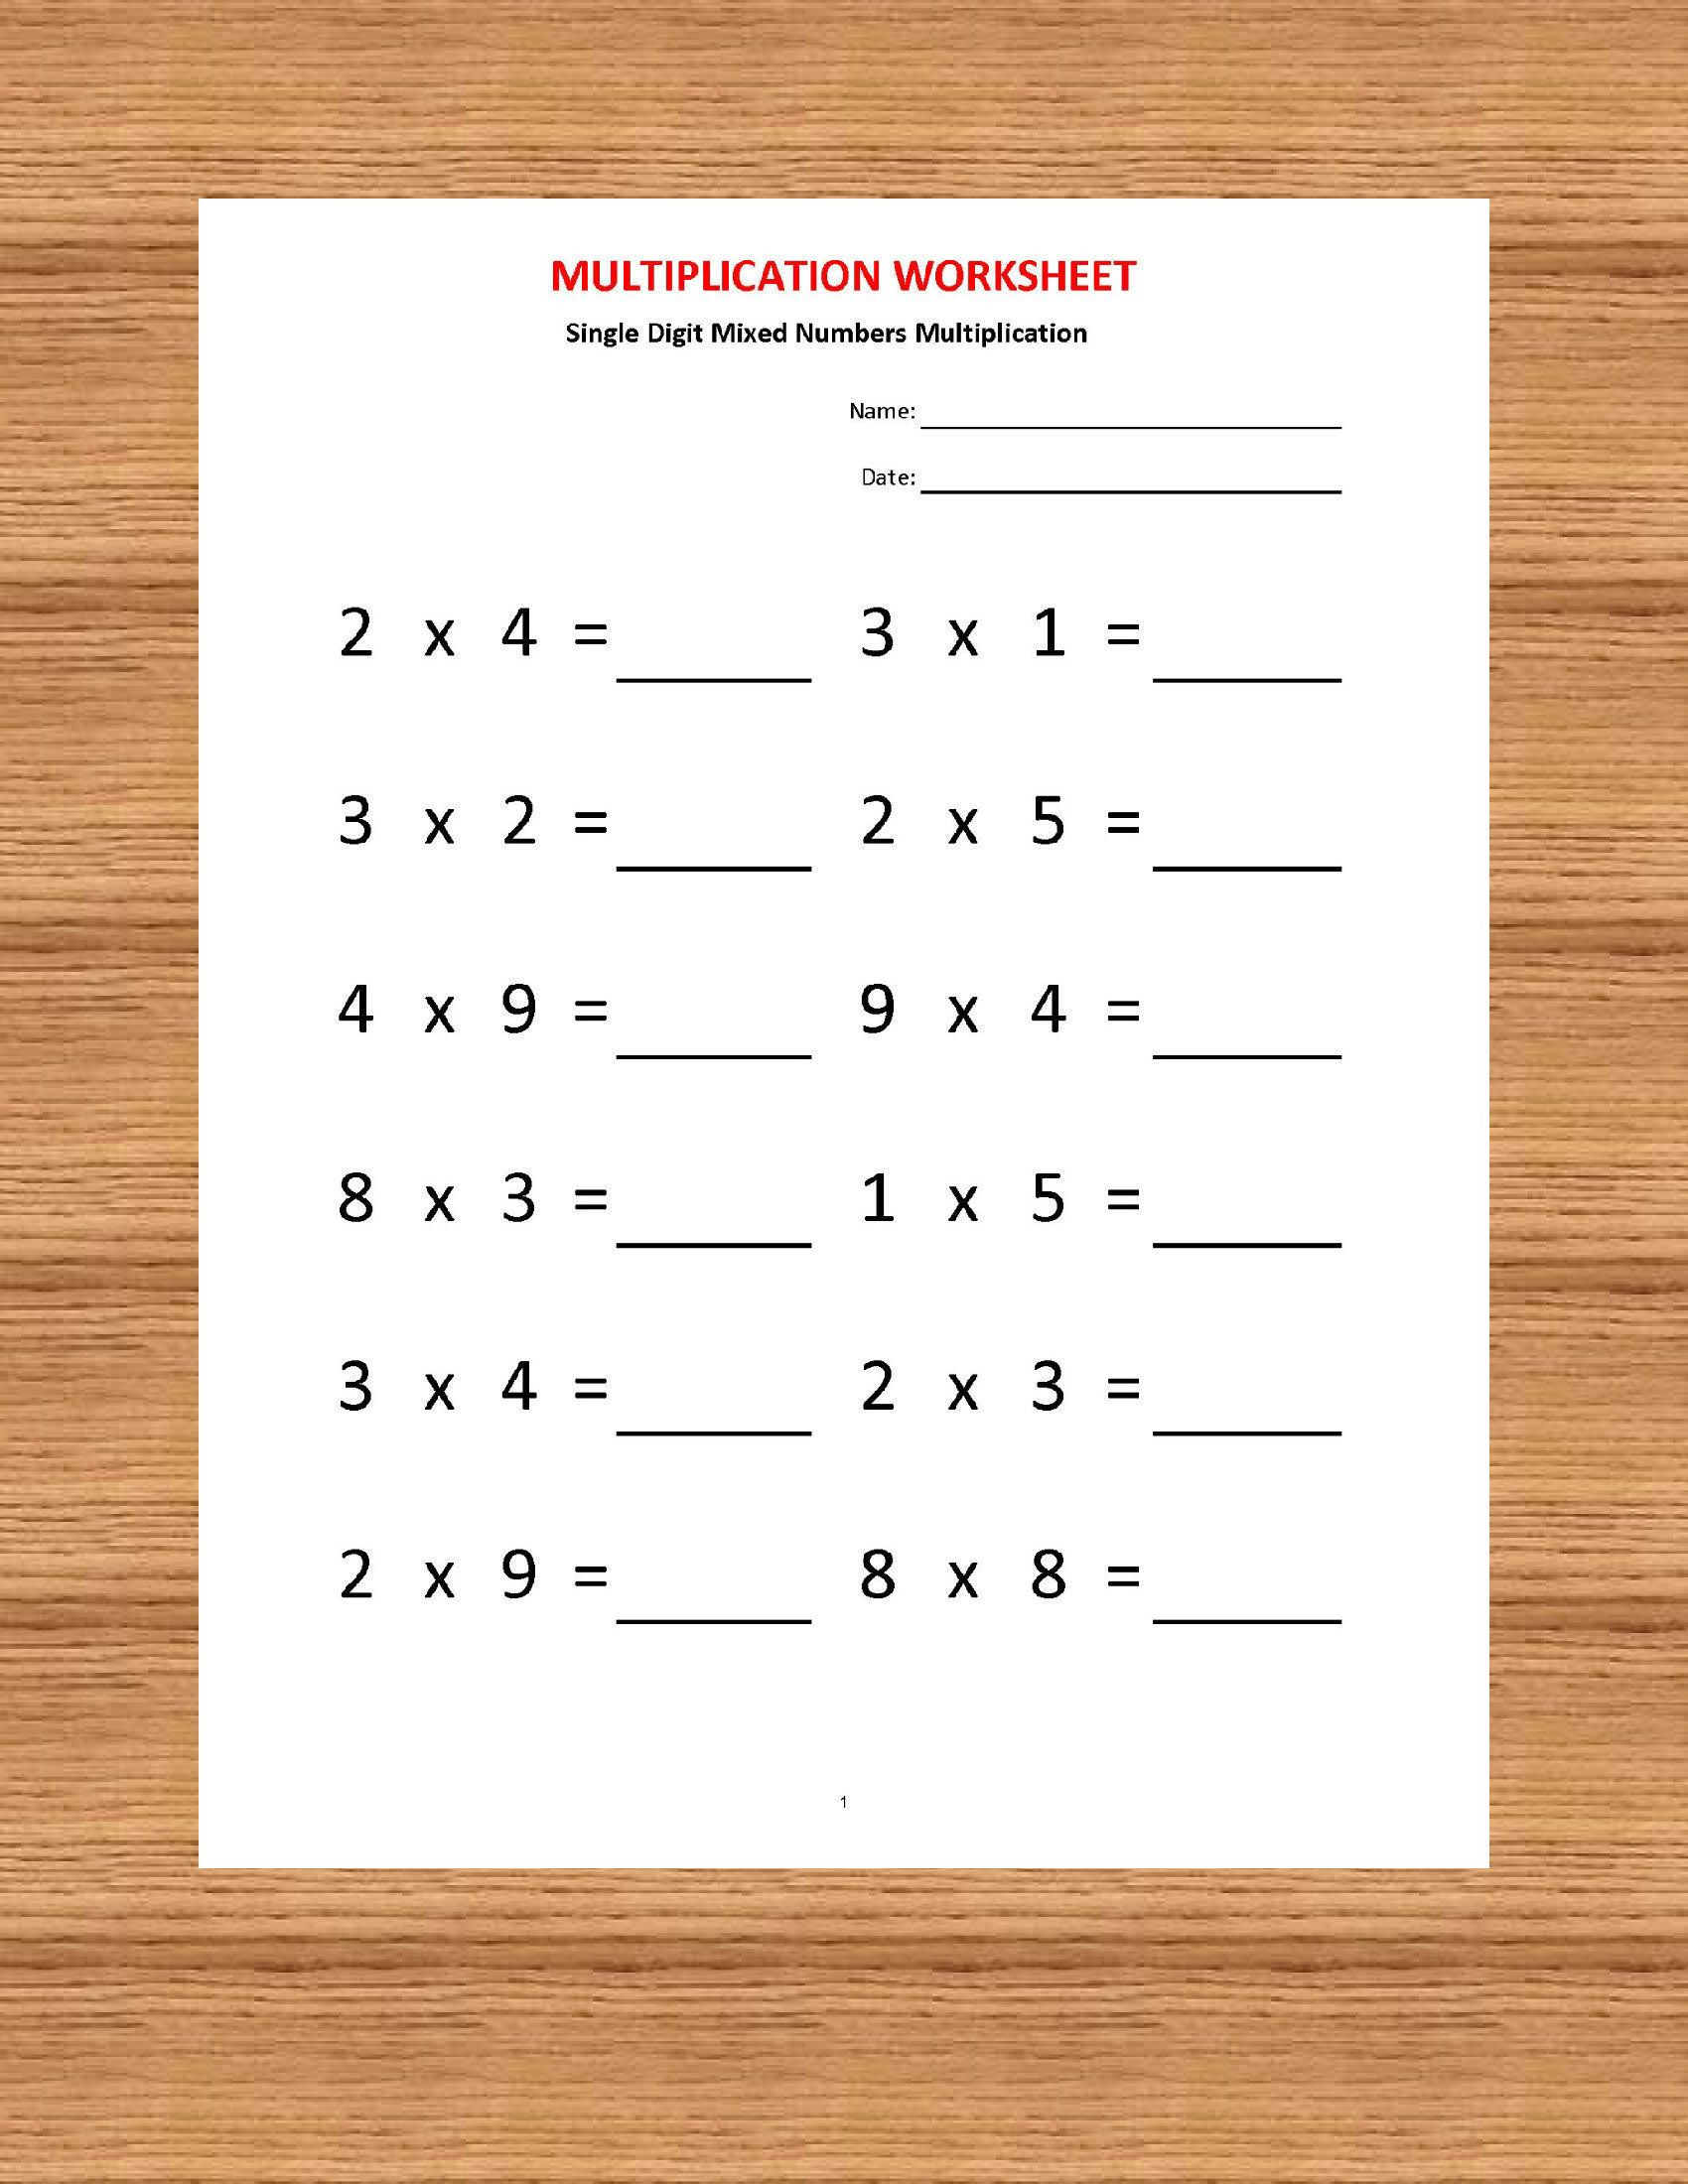 medium resolution of Multiplication Worksheets Printable worksheets   Etsy   2nd grade worksheets